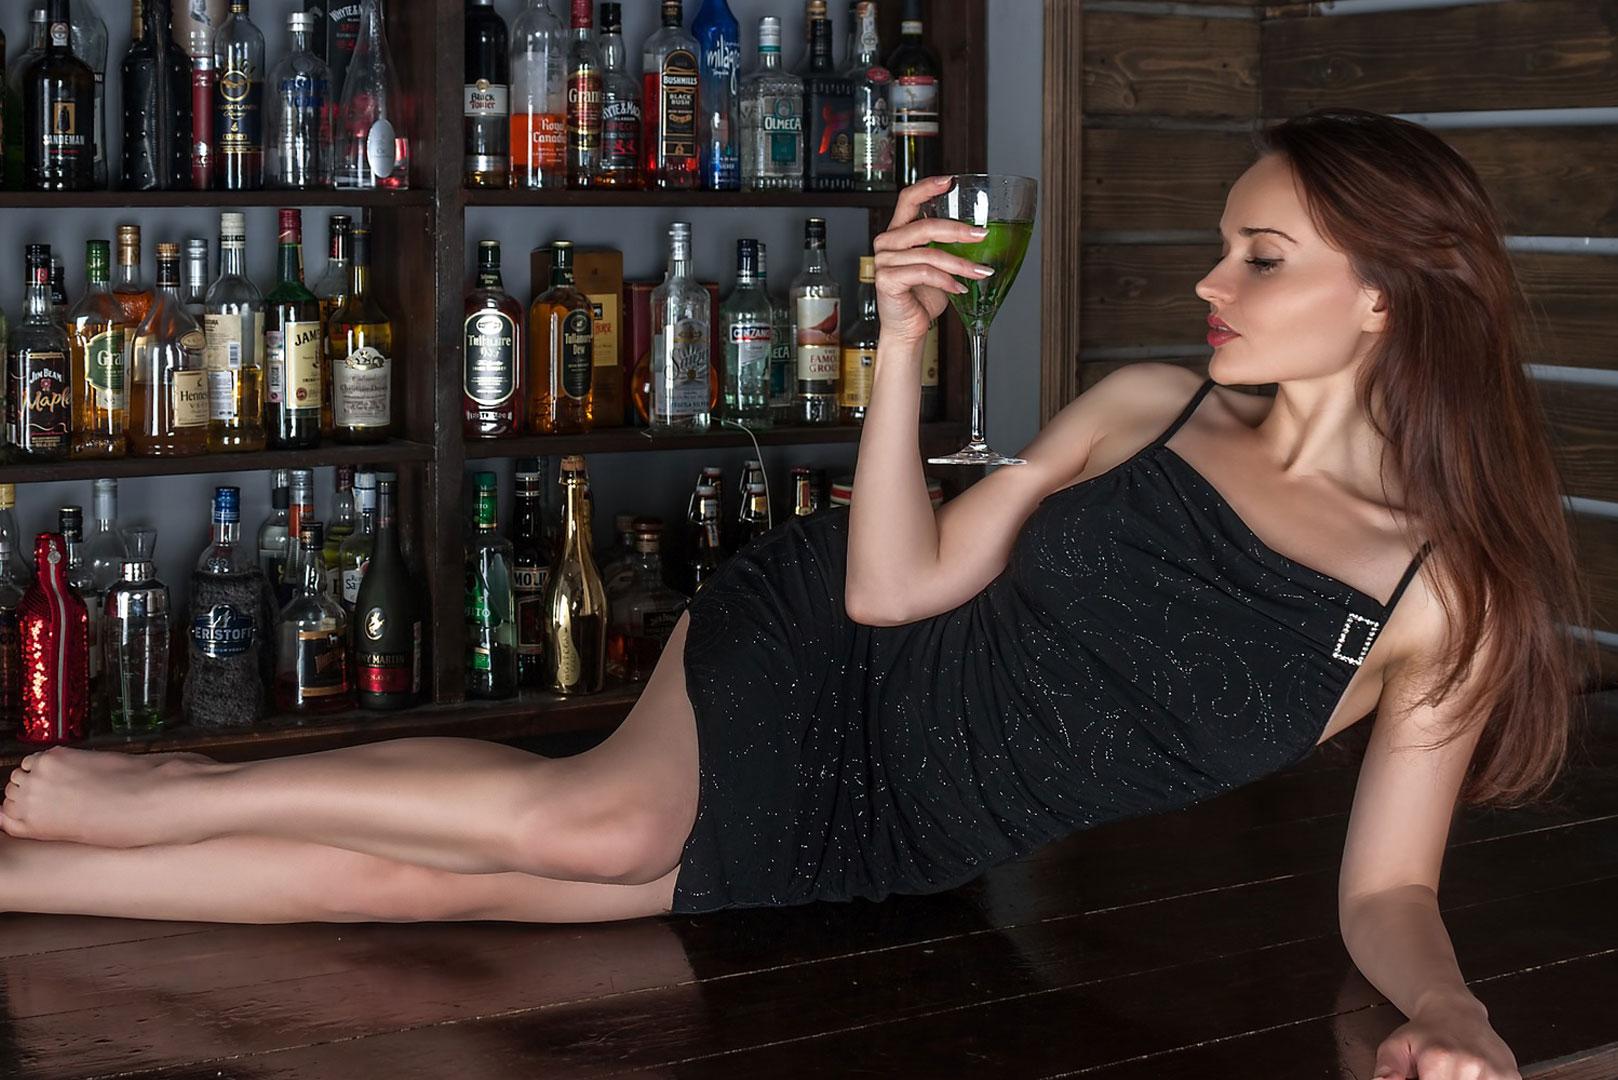 Enema blogs alcoholism girl closet movie xxx shemale brasil